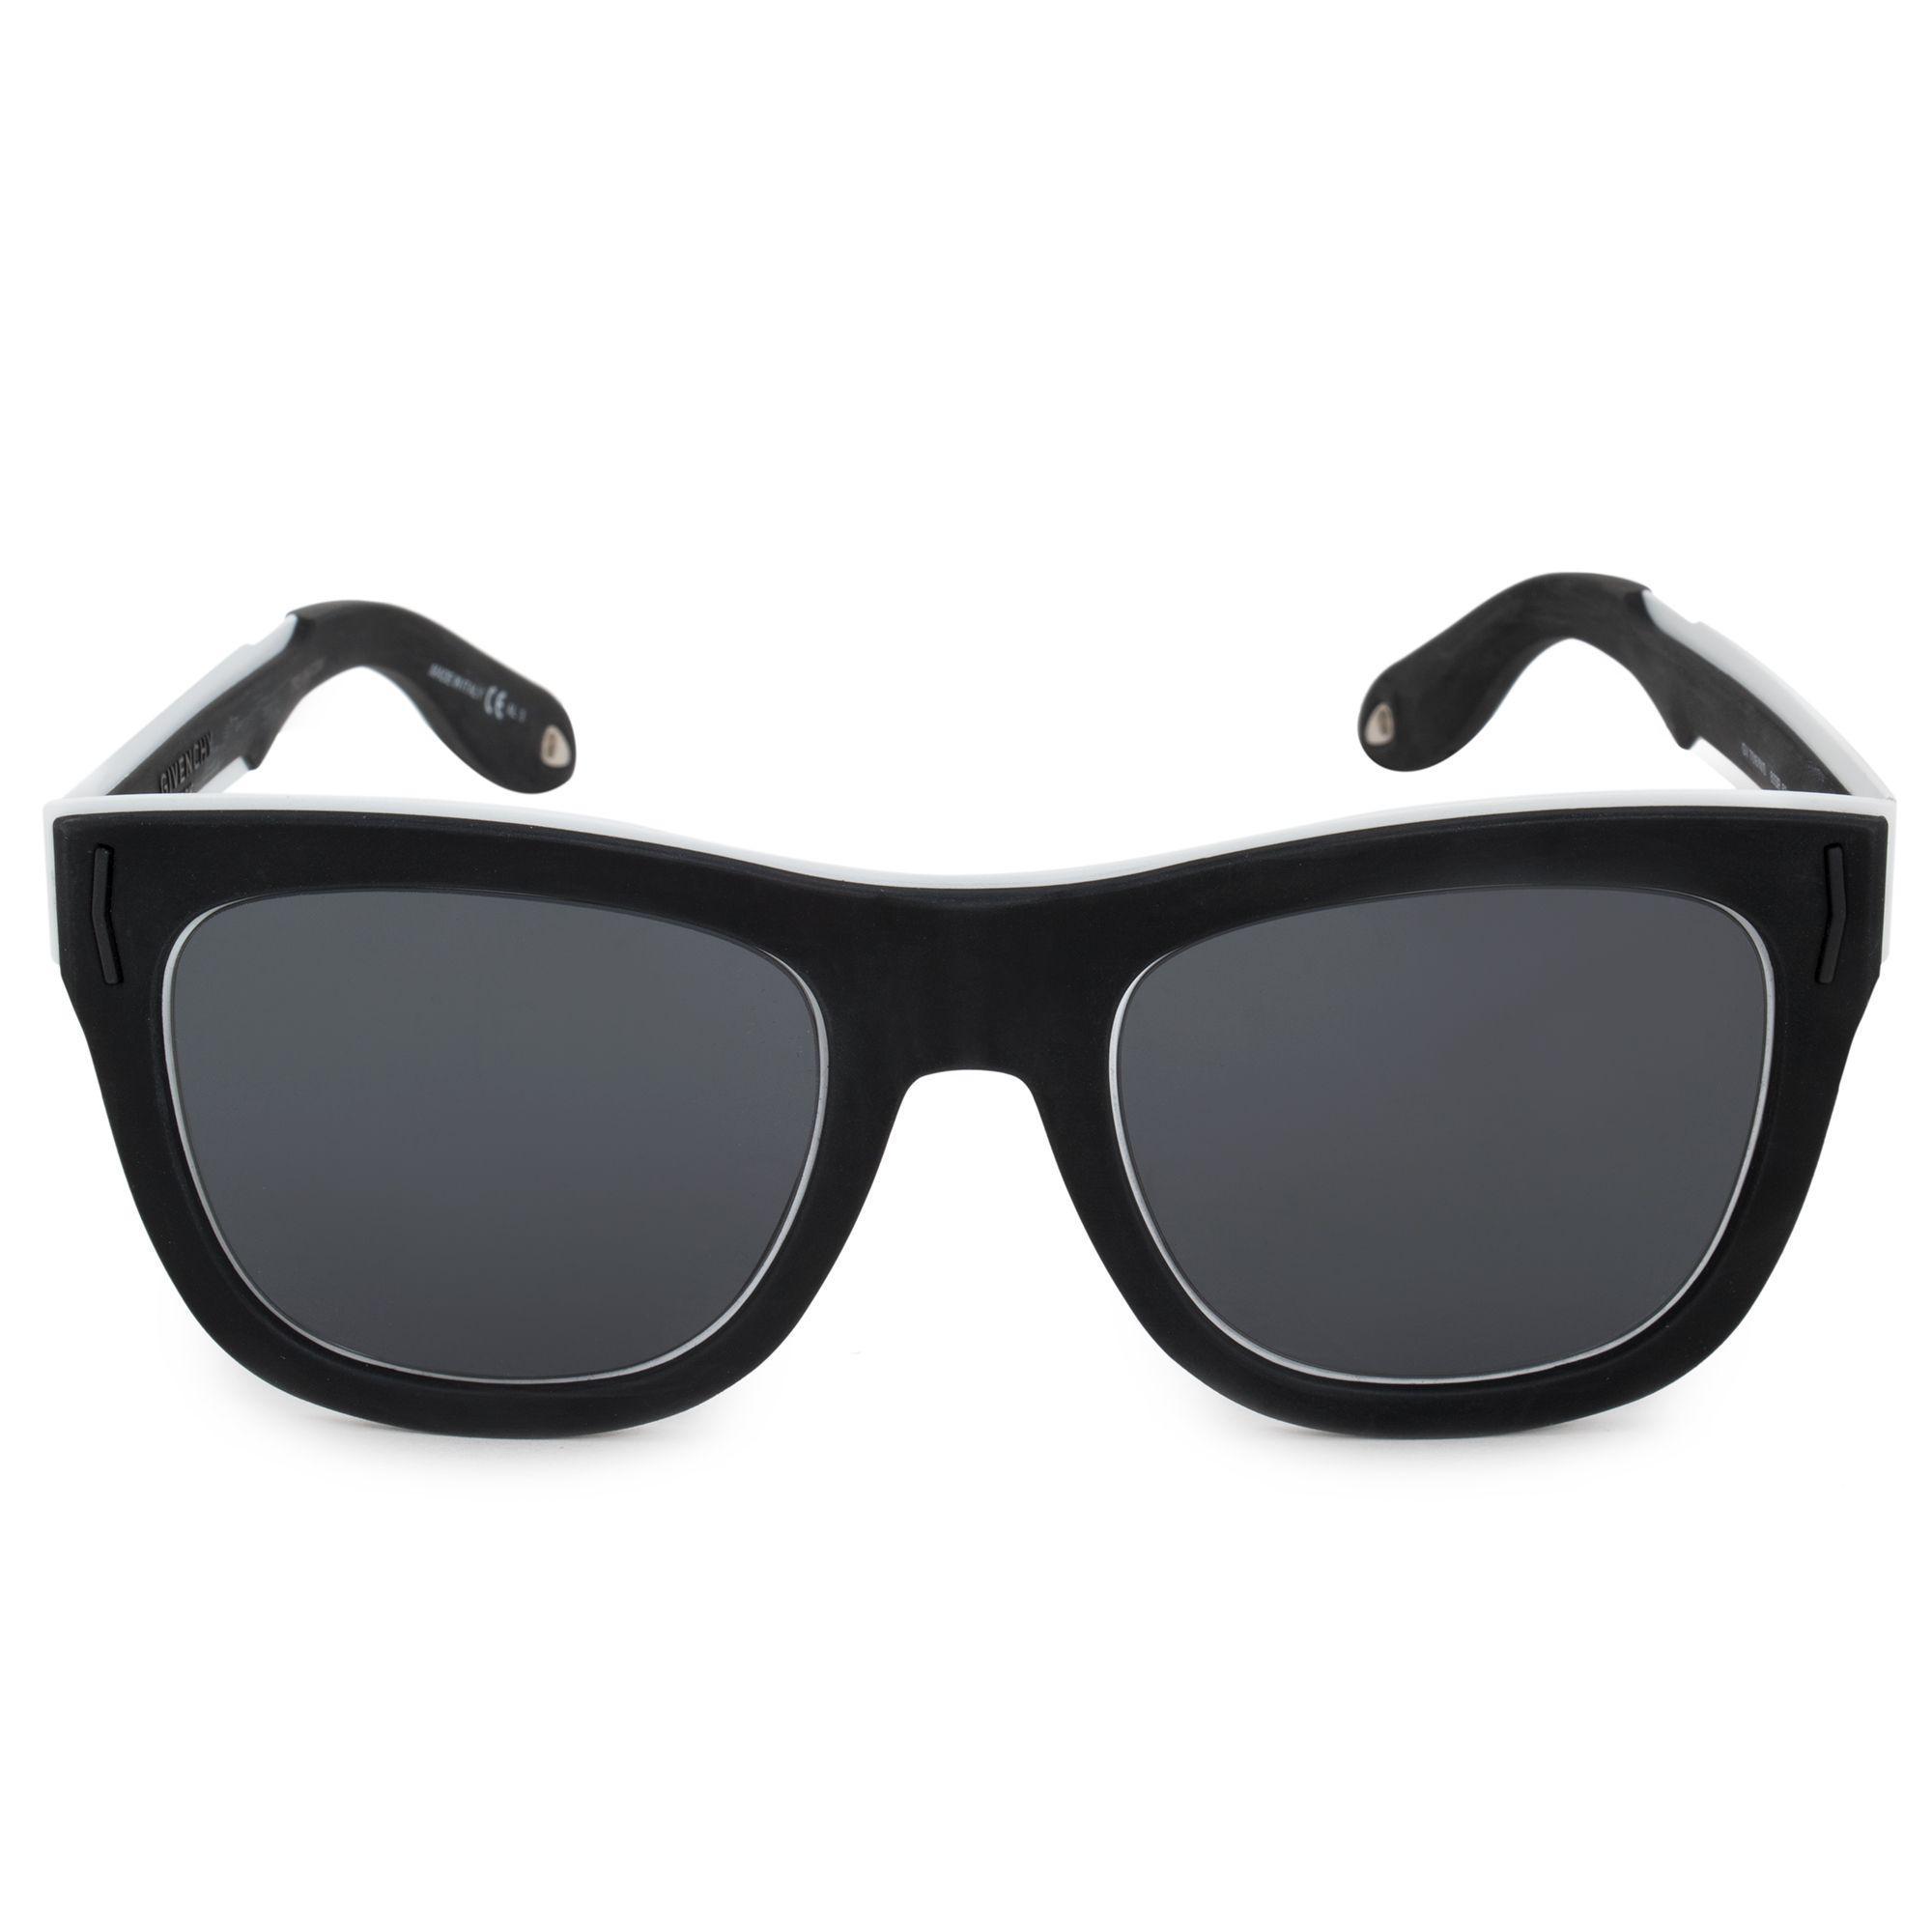 8ad1051ba83c Lyst - Givenchy Wayfarer Sunglasses Gv7016/s N 80s/ir 52 in Black